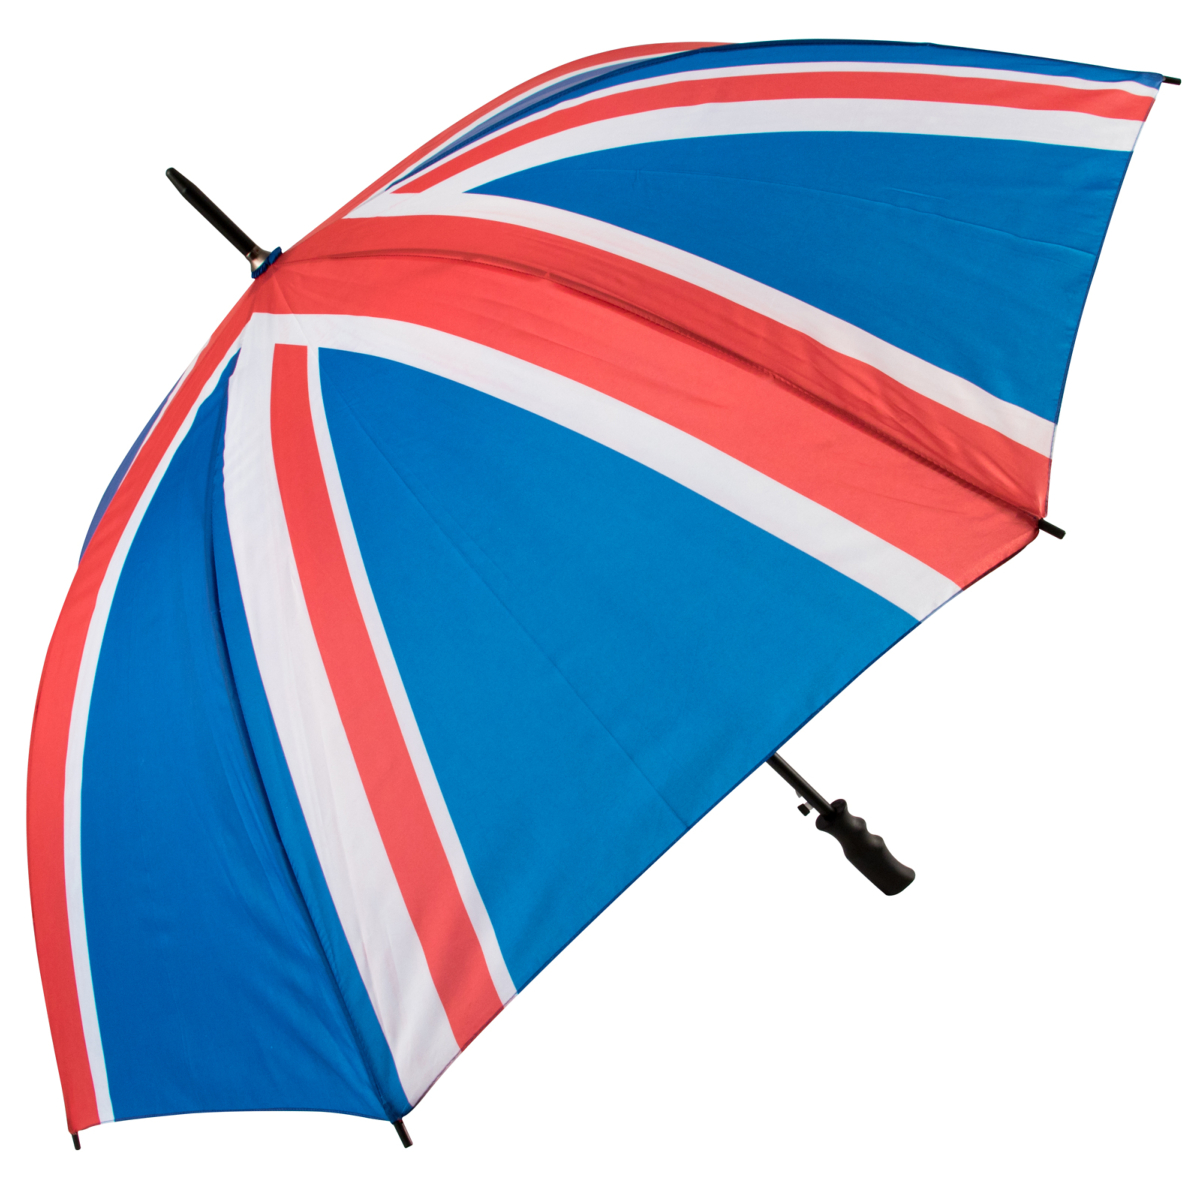 Union jack umbrella.